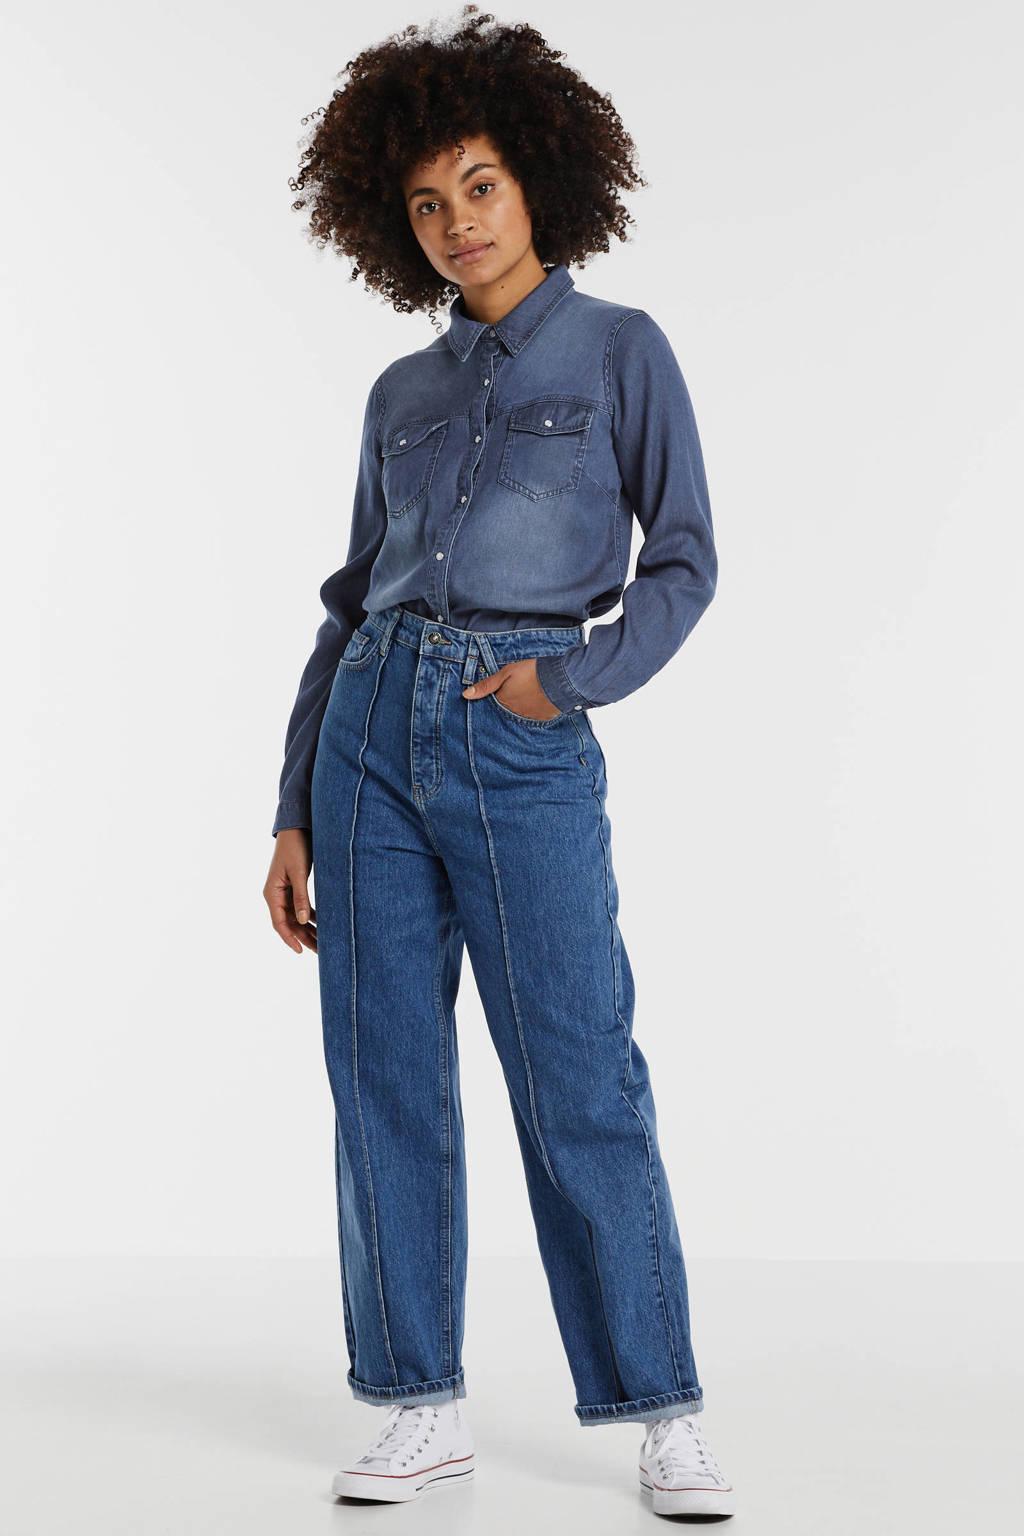 VILA spijkerblouse VIBISTA dark blue denim, Blauw